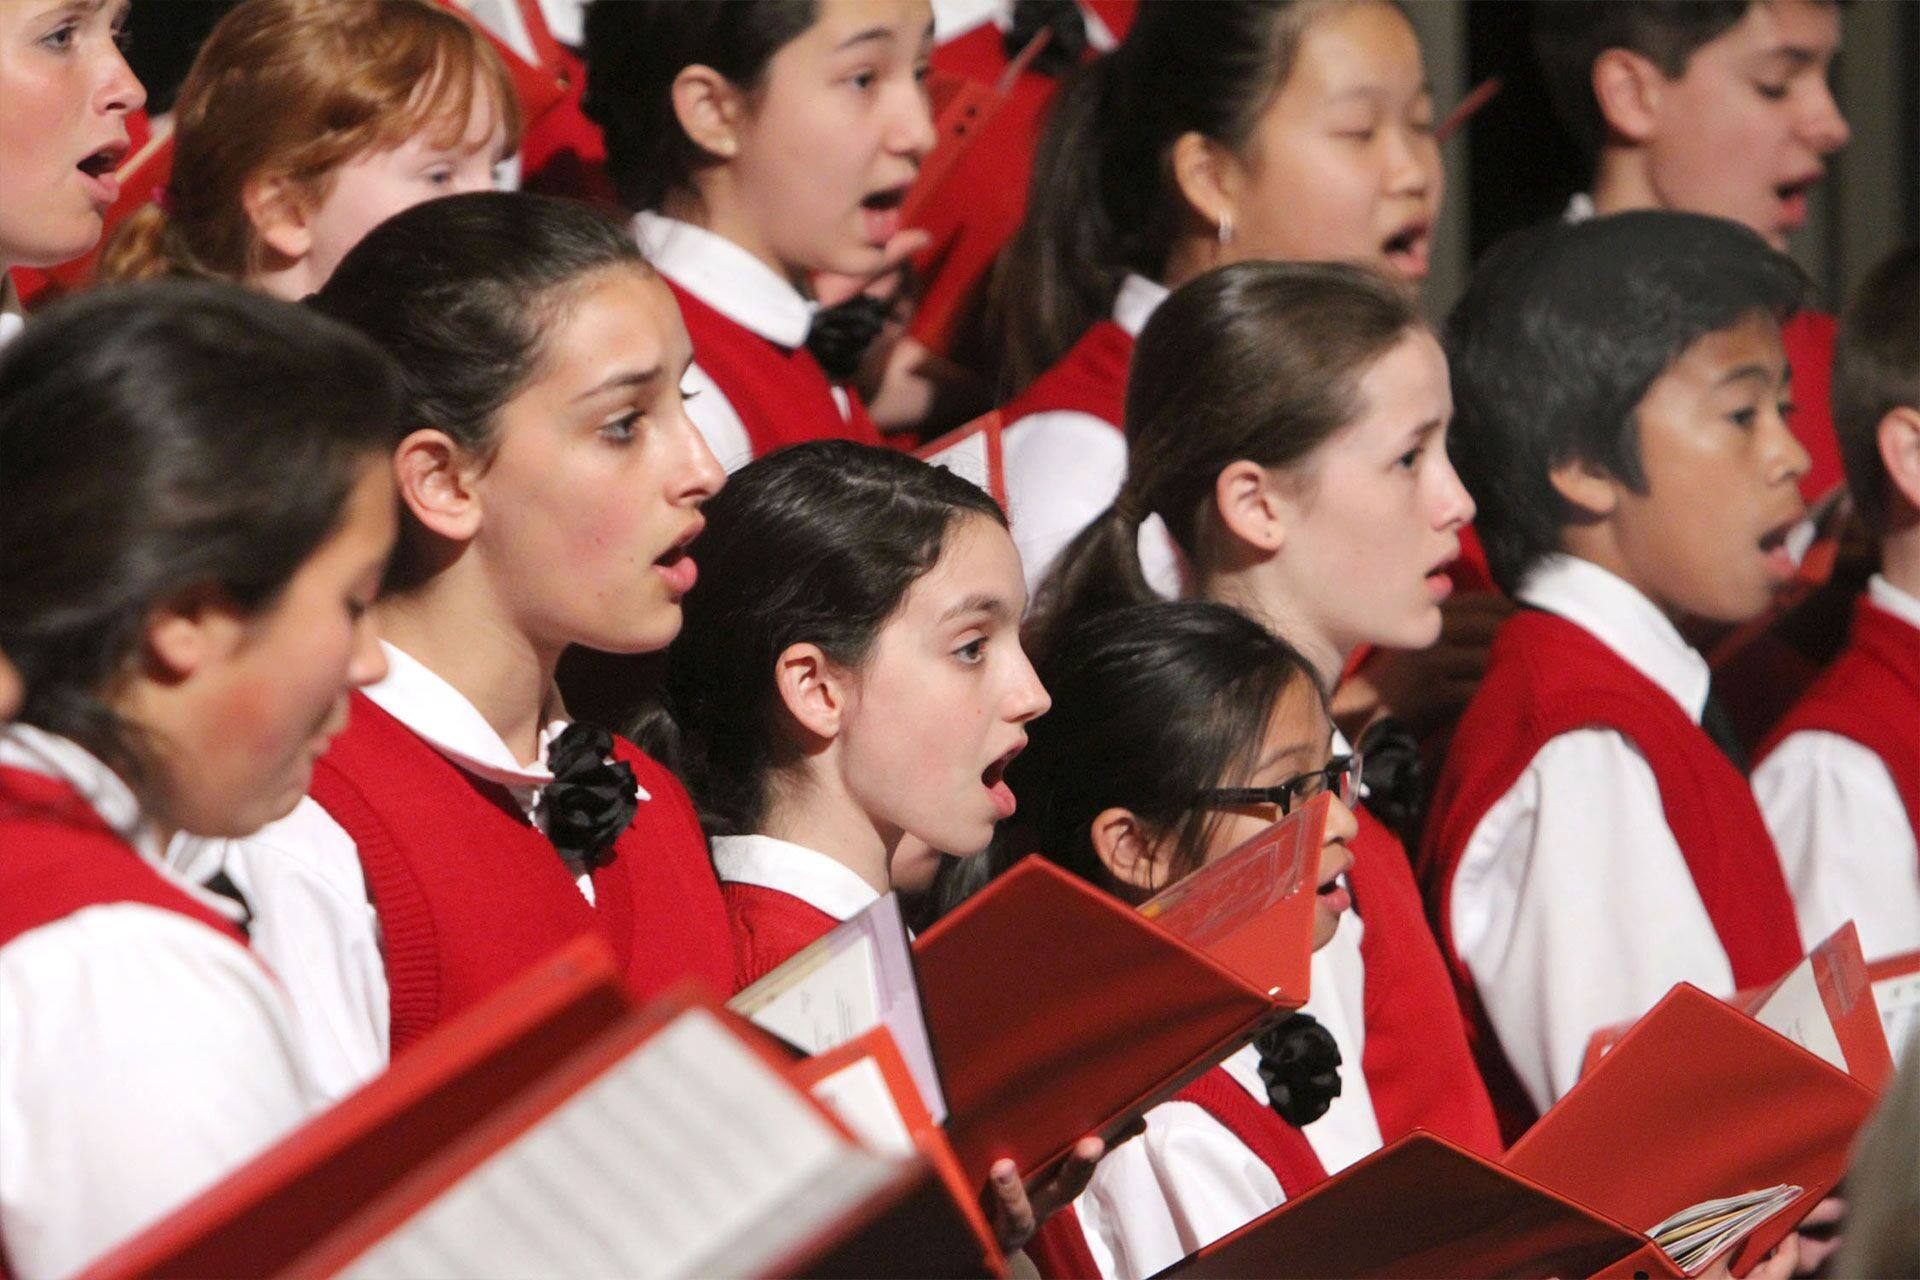 Los Angeles Children's Chorus singing on stage